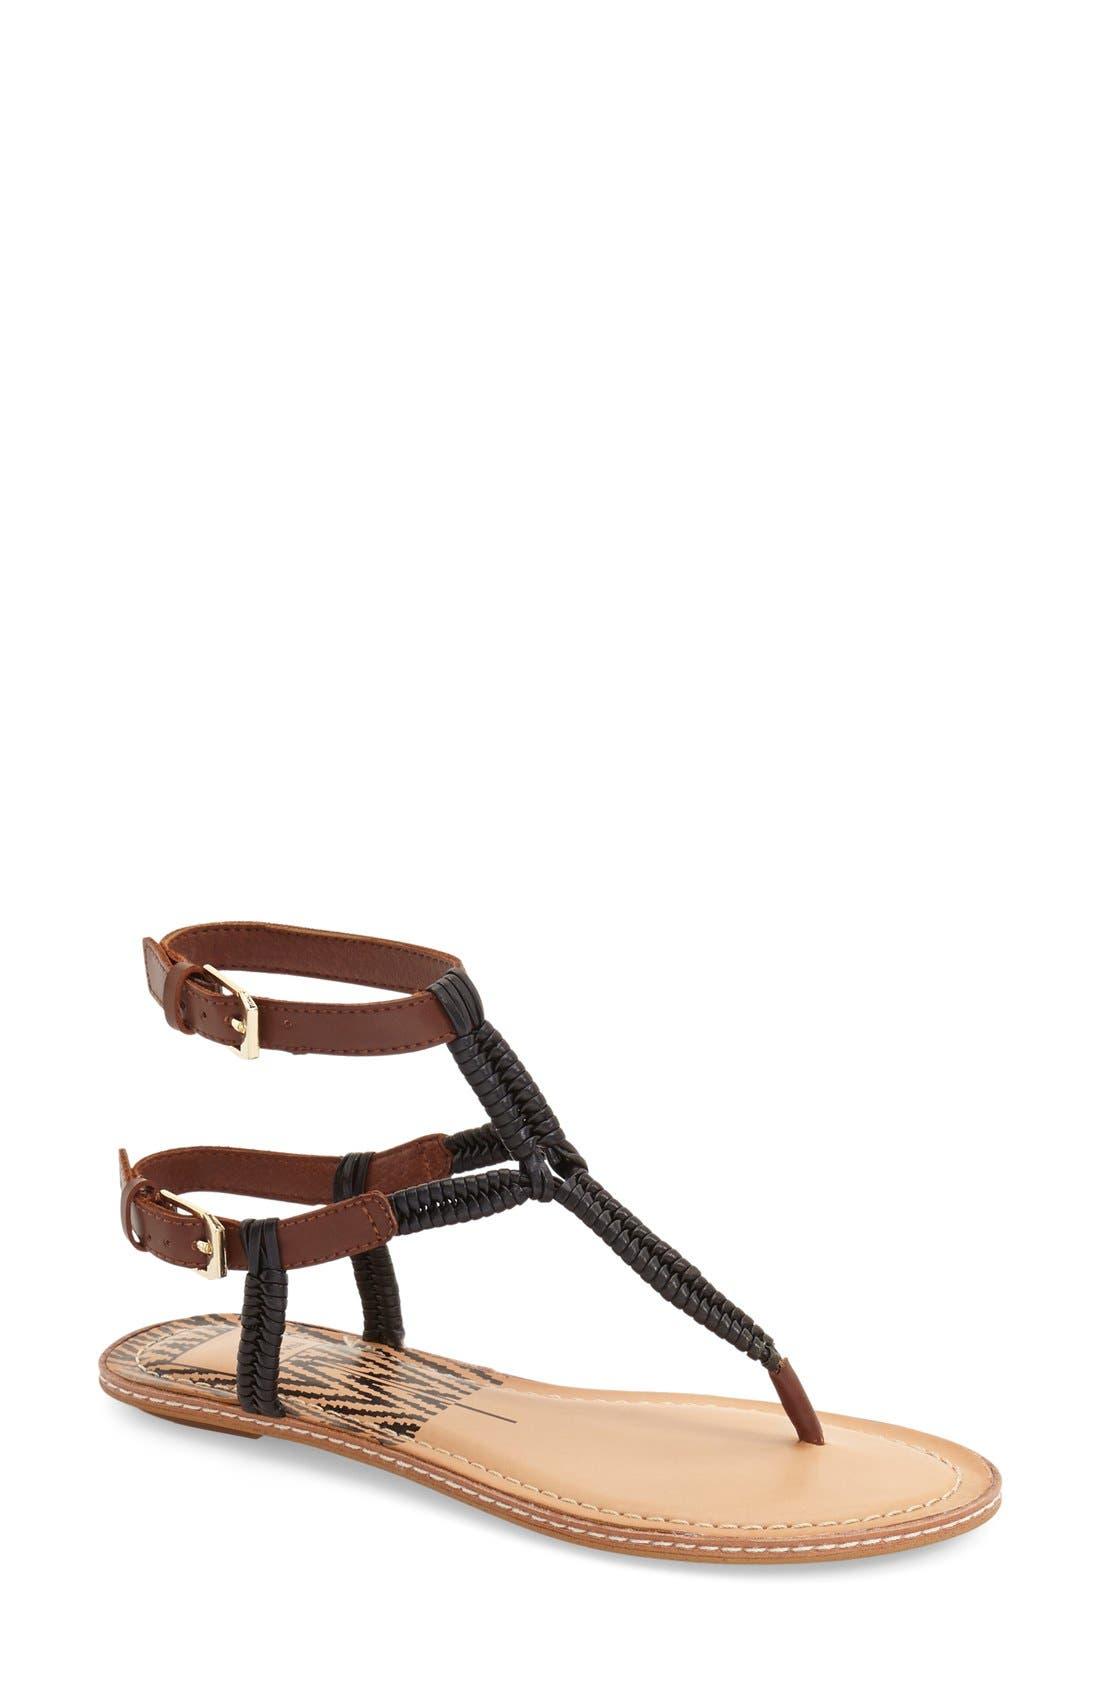 Alternate Image 1 Selected - Dolce Vita 'Kendra' Flat Sandal (Women)